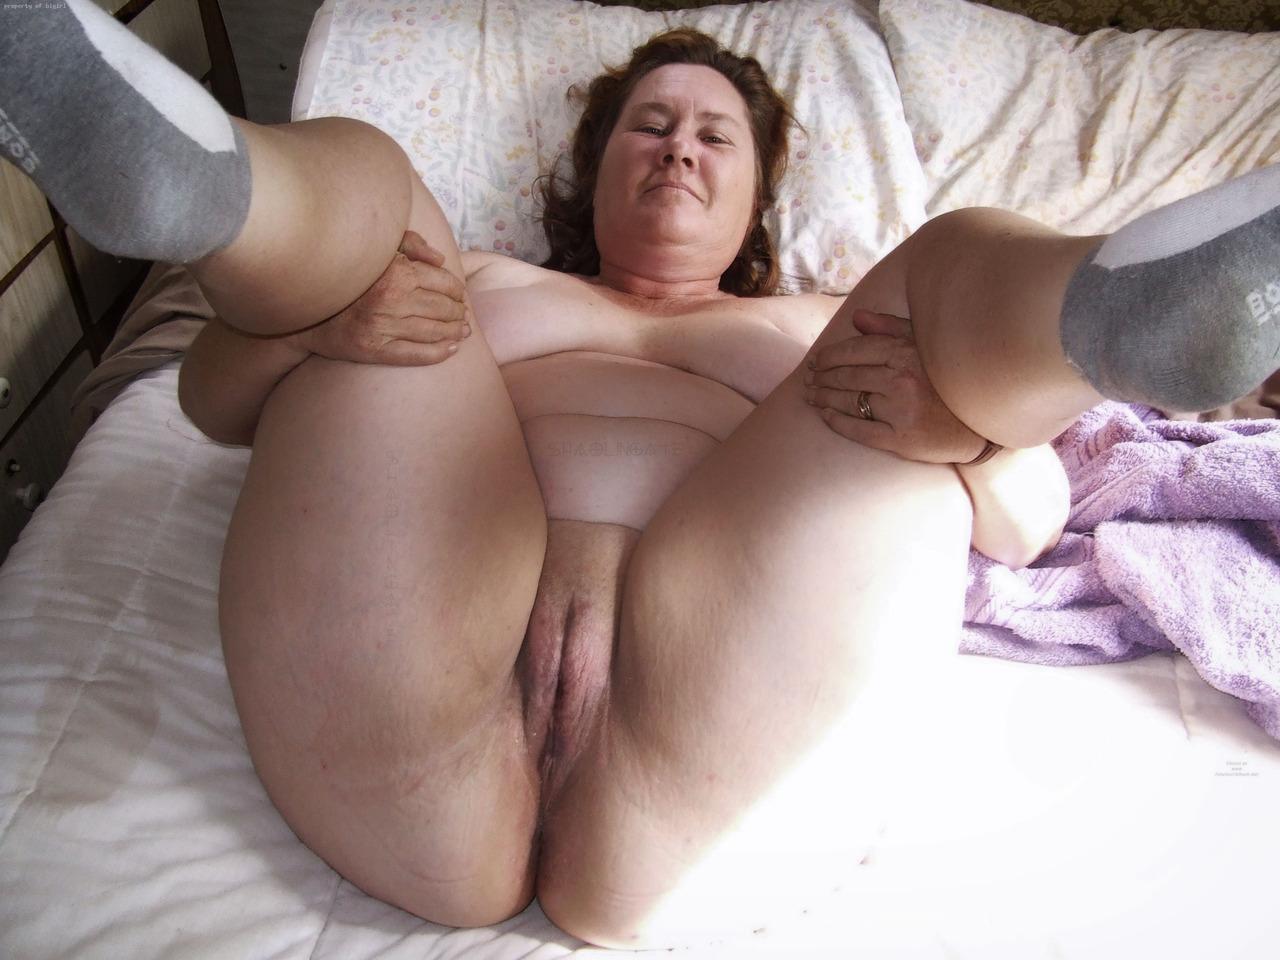 Big women porn on xhamster